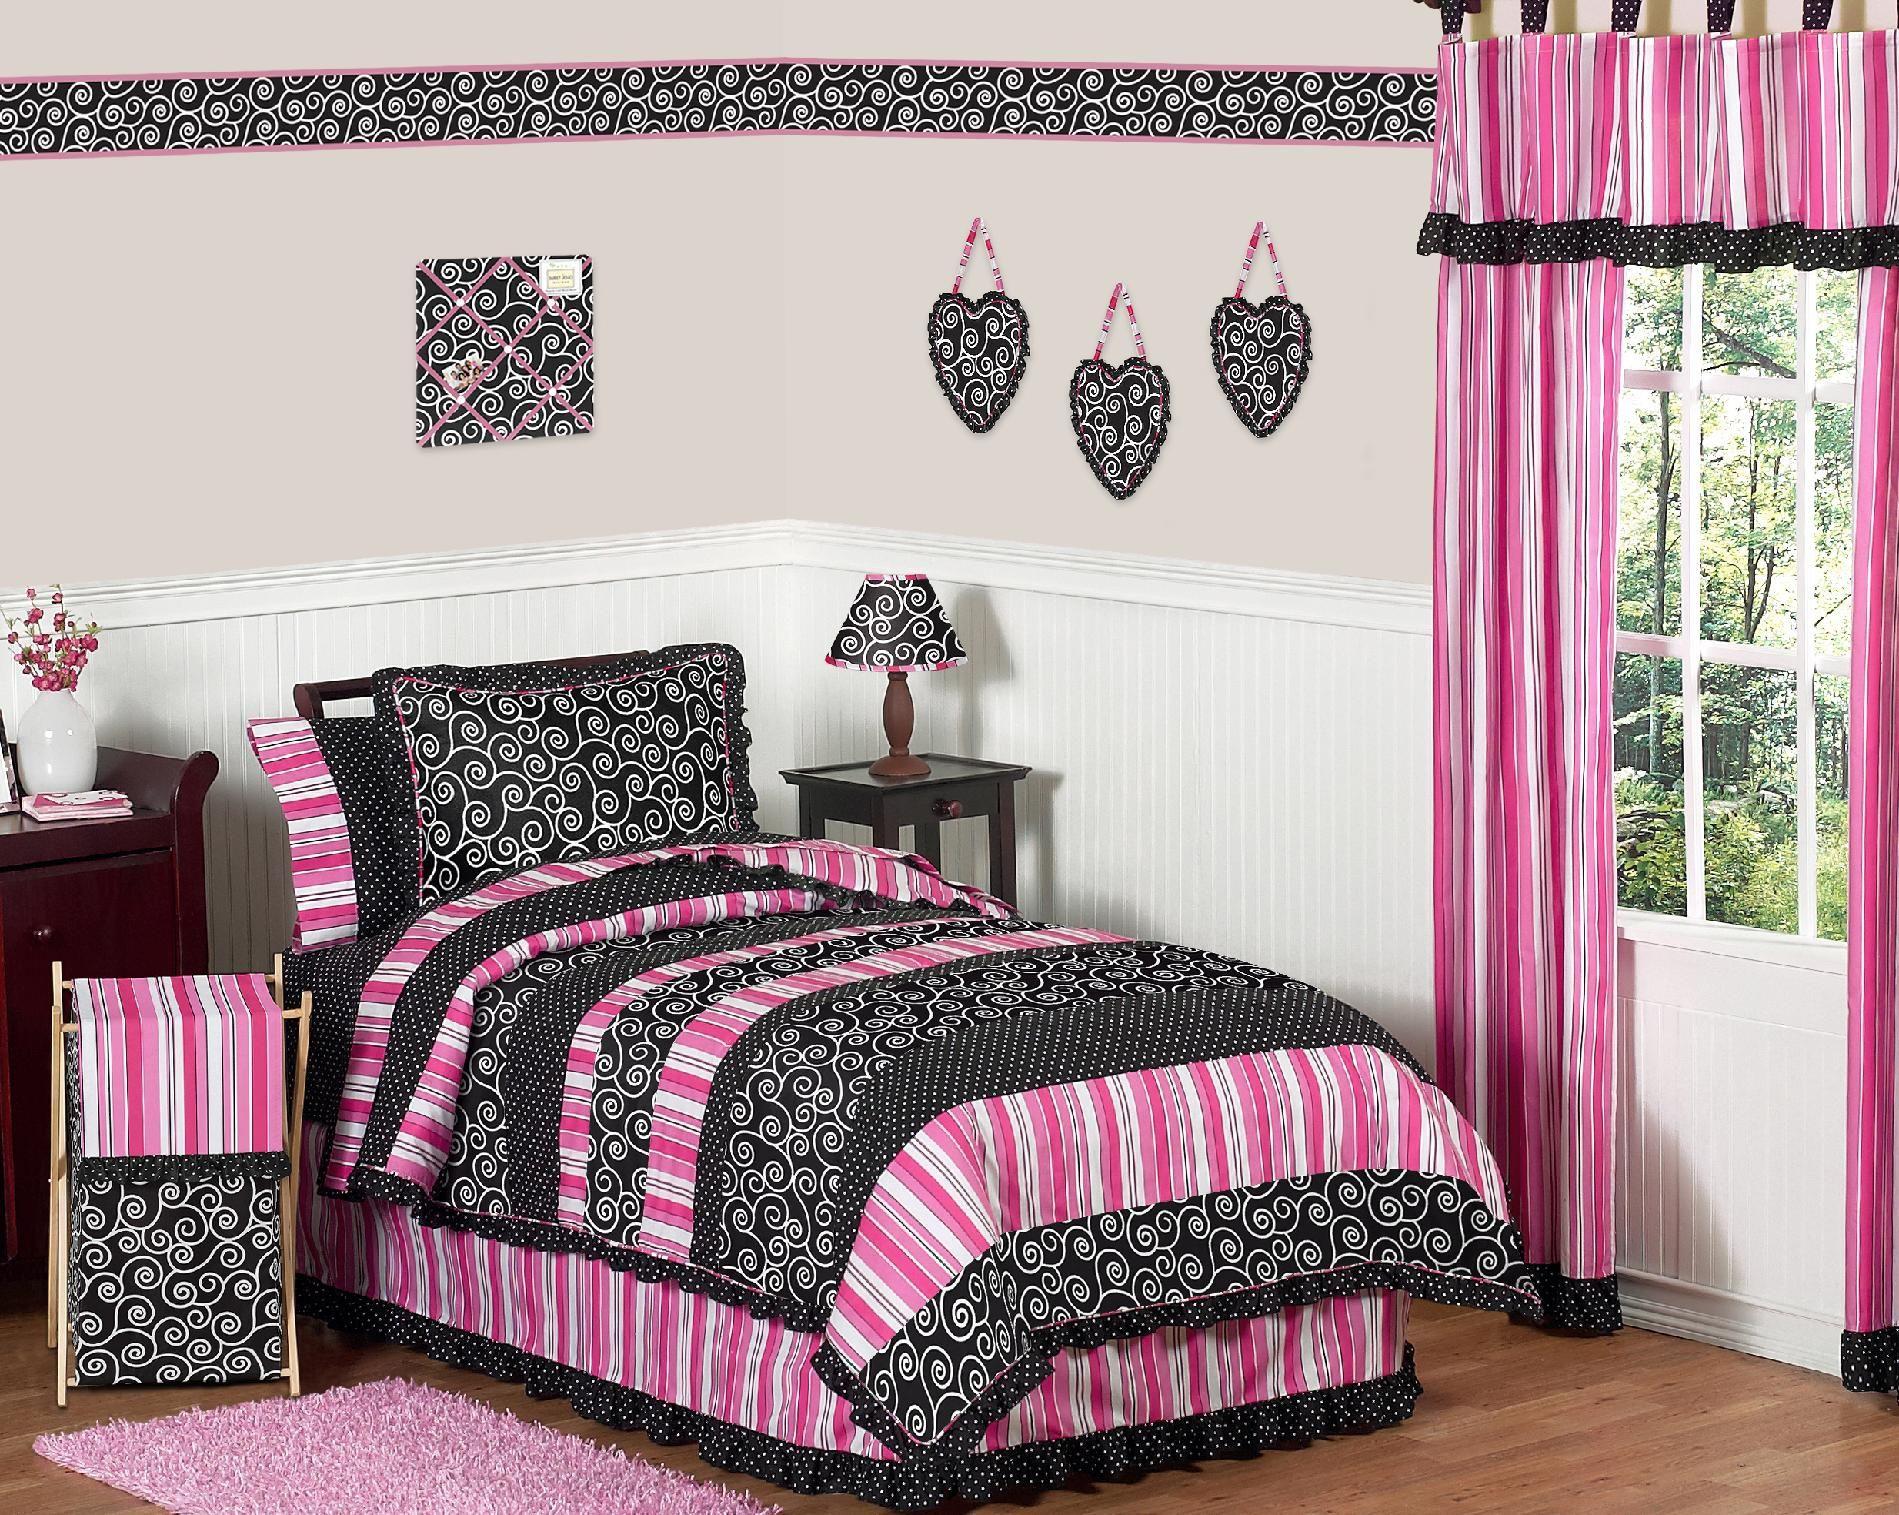 Sweet Jojo Designs Madison Collection 3pc Full Queen Bedding Set